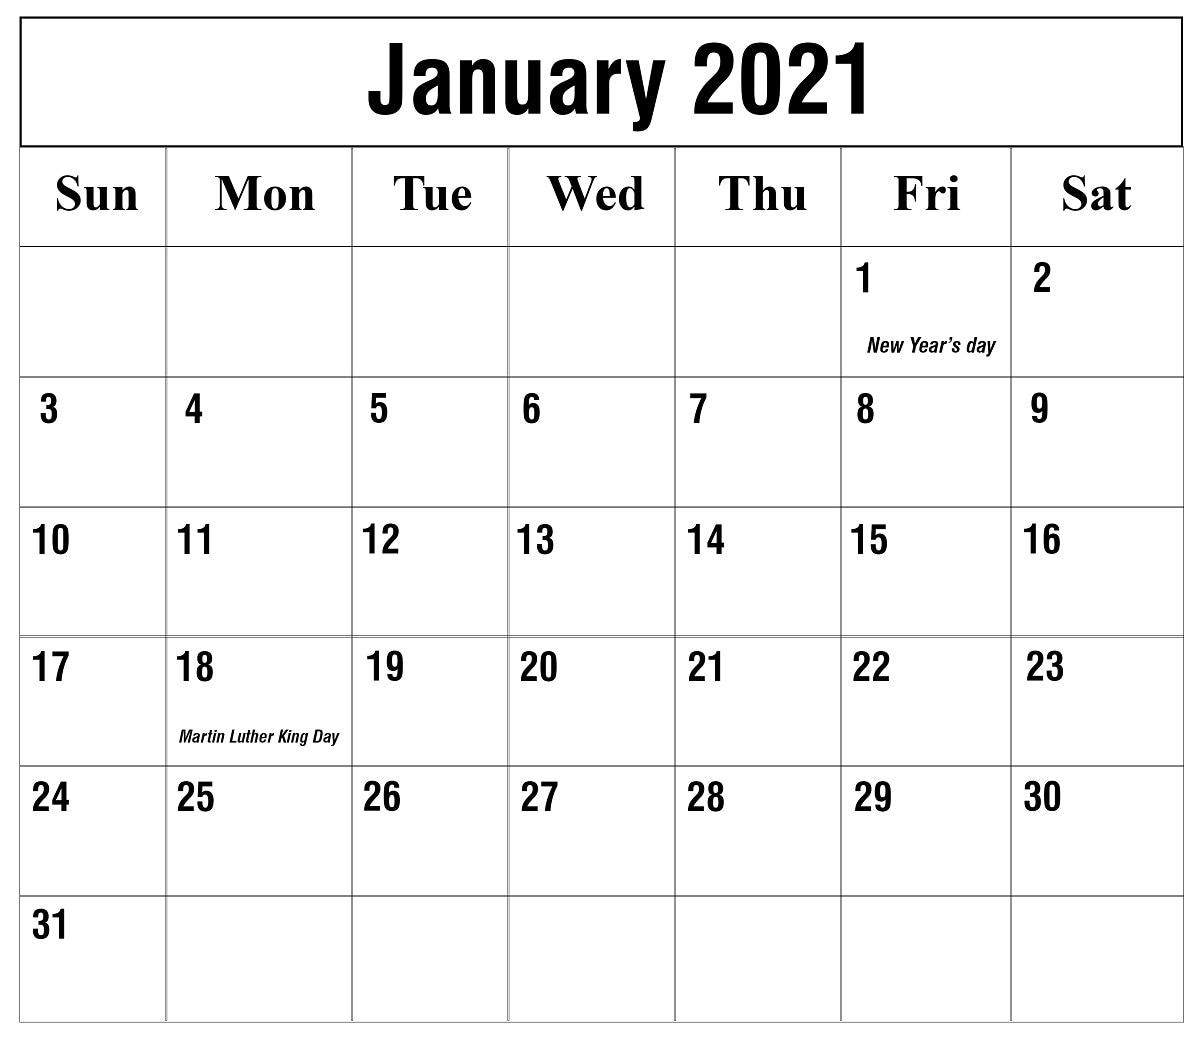 Free January 2021 Printable Calendar Template In Pdf, Excel In Julian Vs Gregorian Calendar 2021